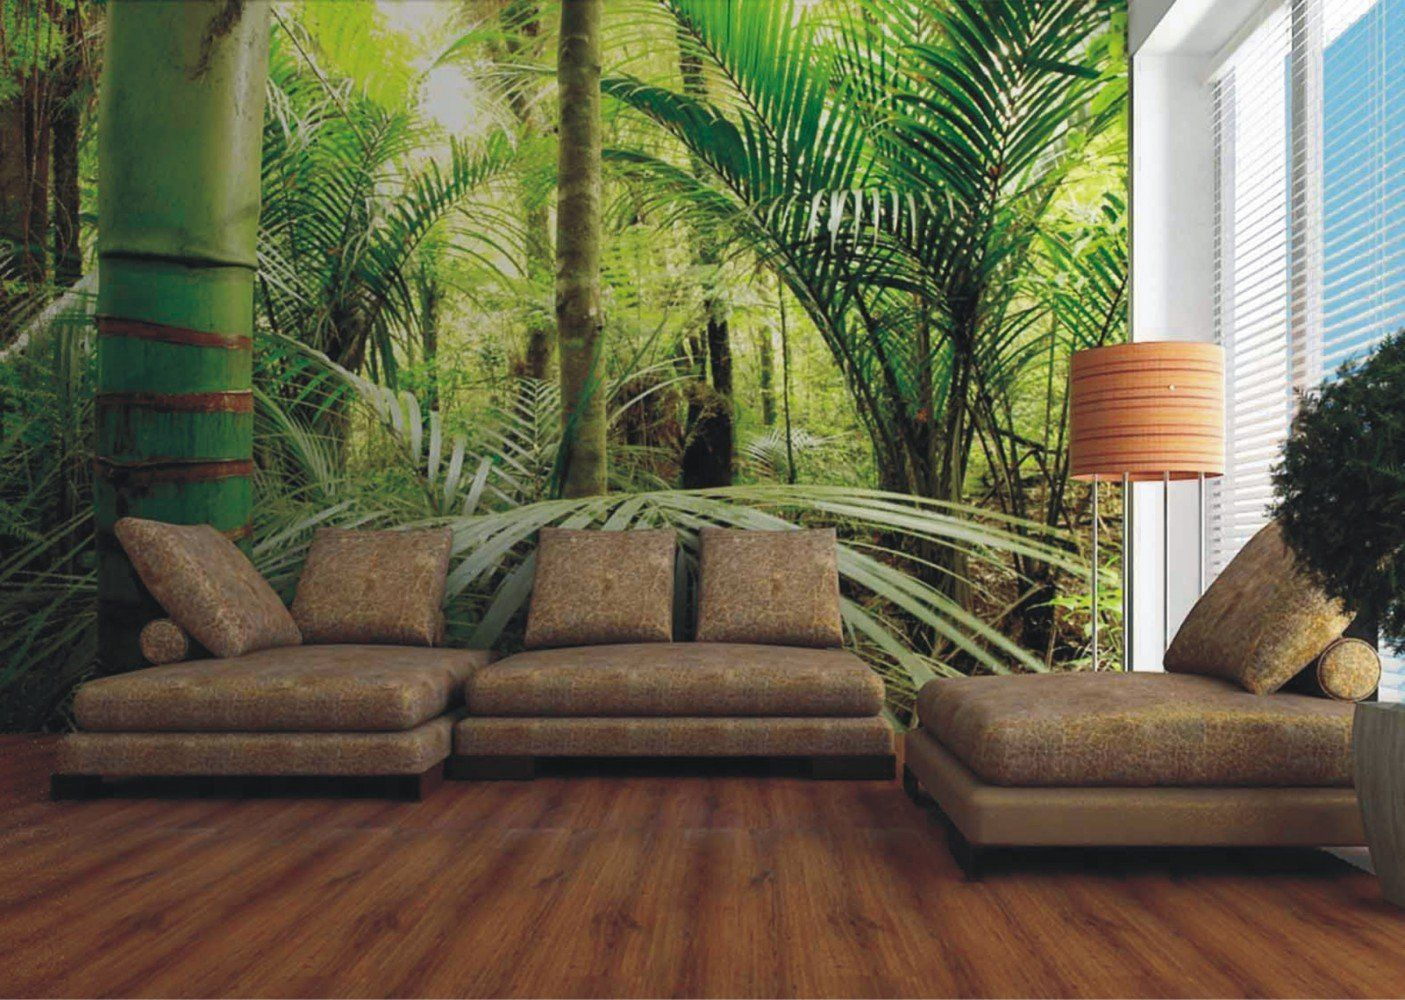 Great Fototapete Tapete Natur Dschungel Wildniss Pflanzen Foto cm x cm Amazon de